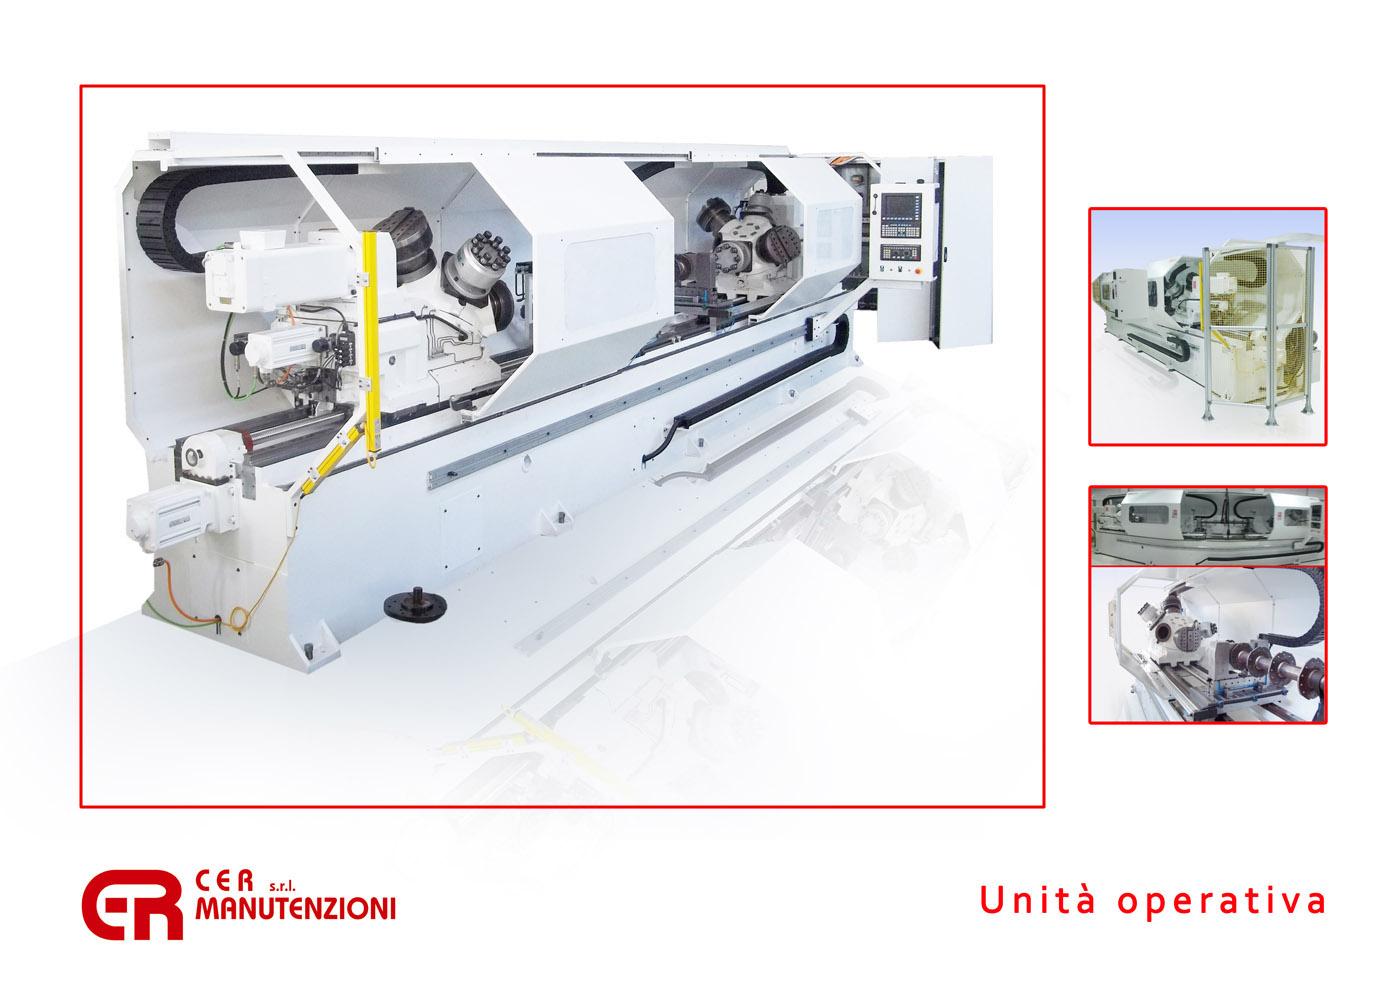 05_Unita_operativa